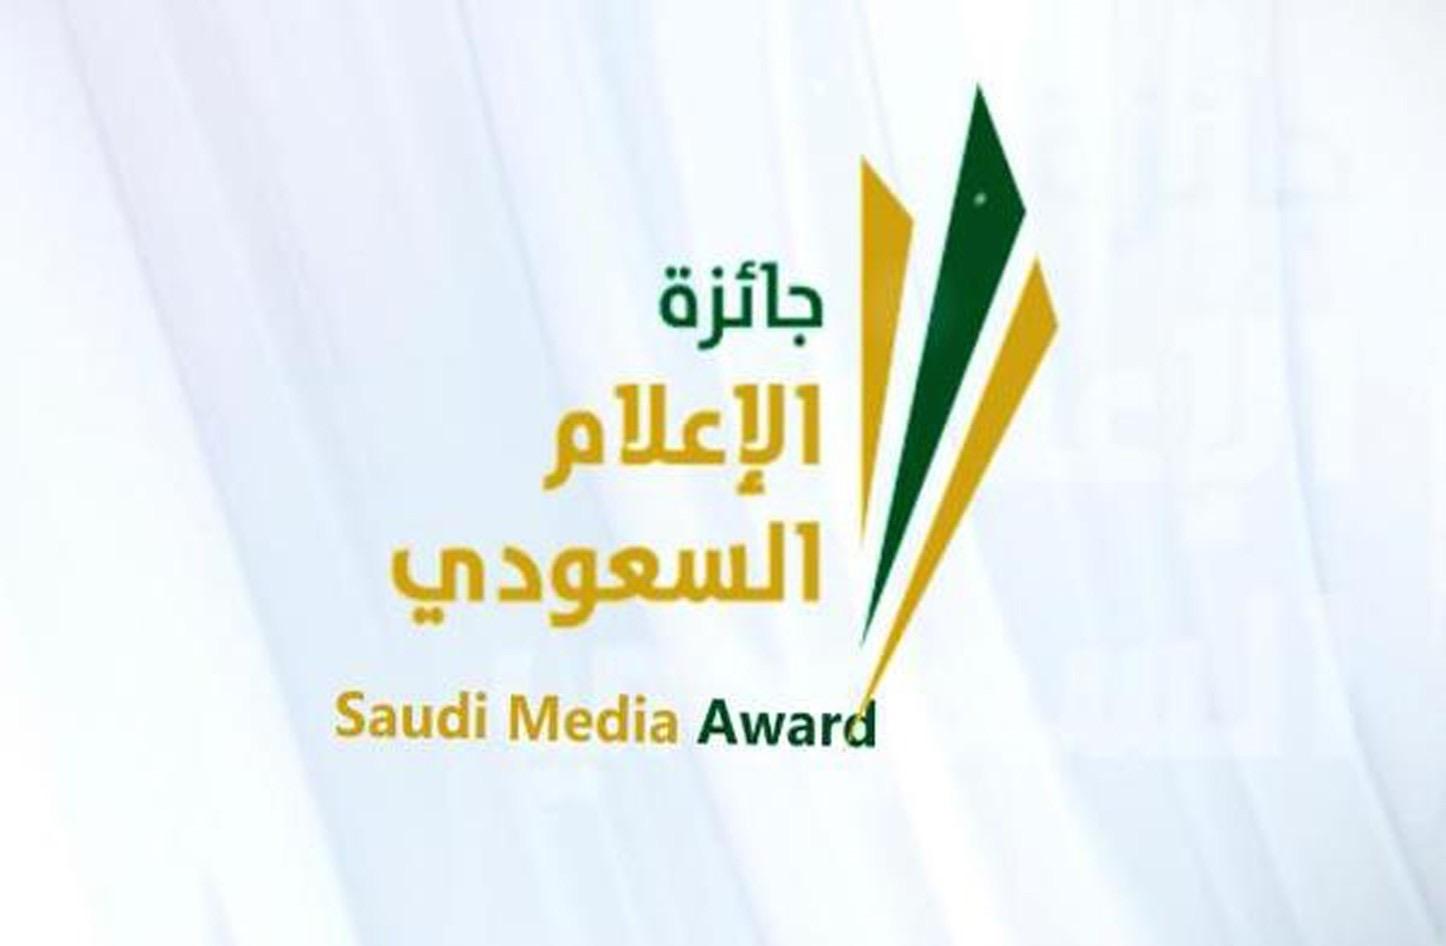 You are currently viewing تشكيل مجلس إدارة جائزة الإعلام السعودي